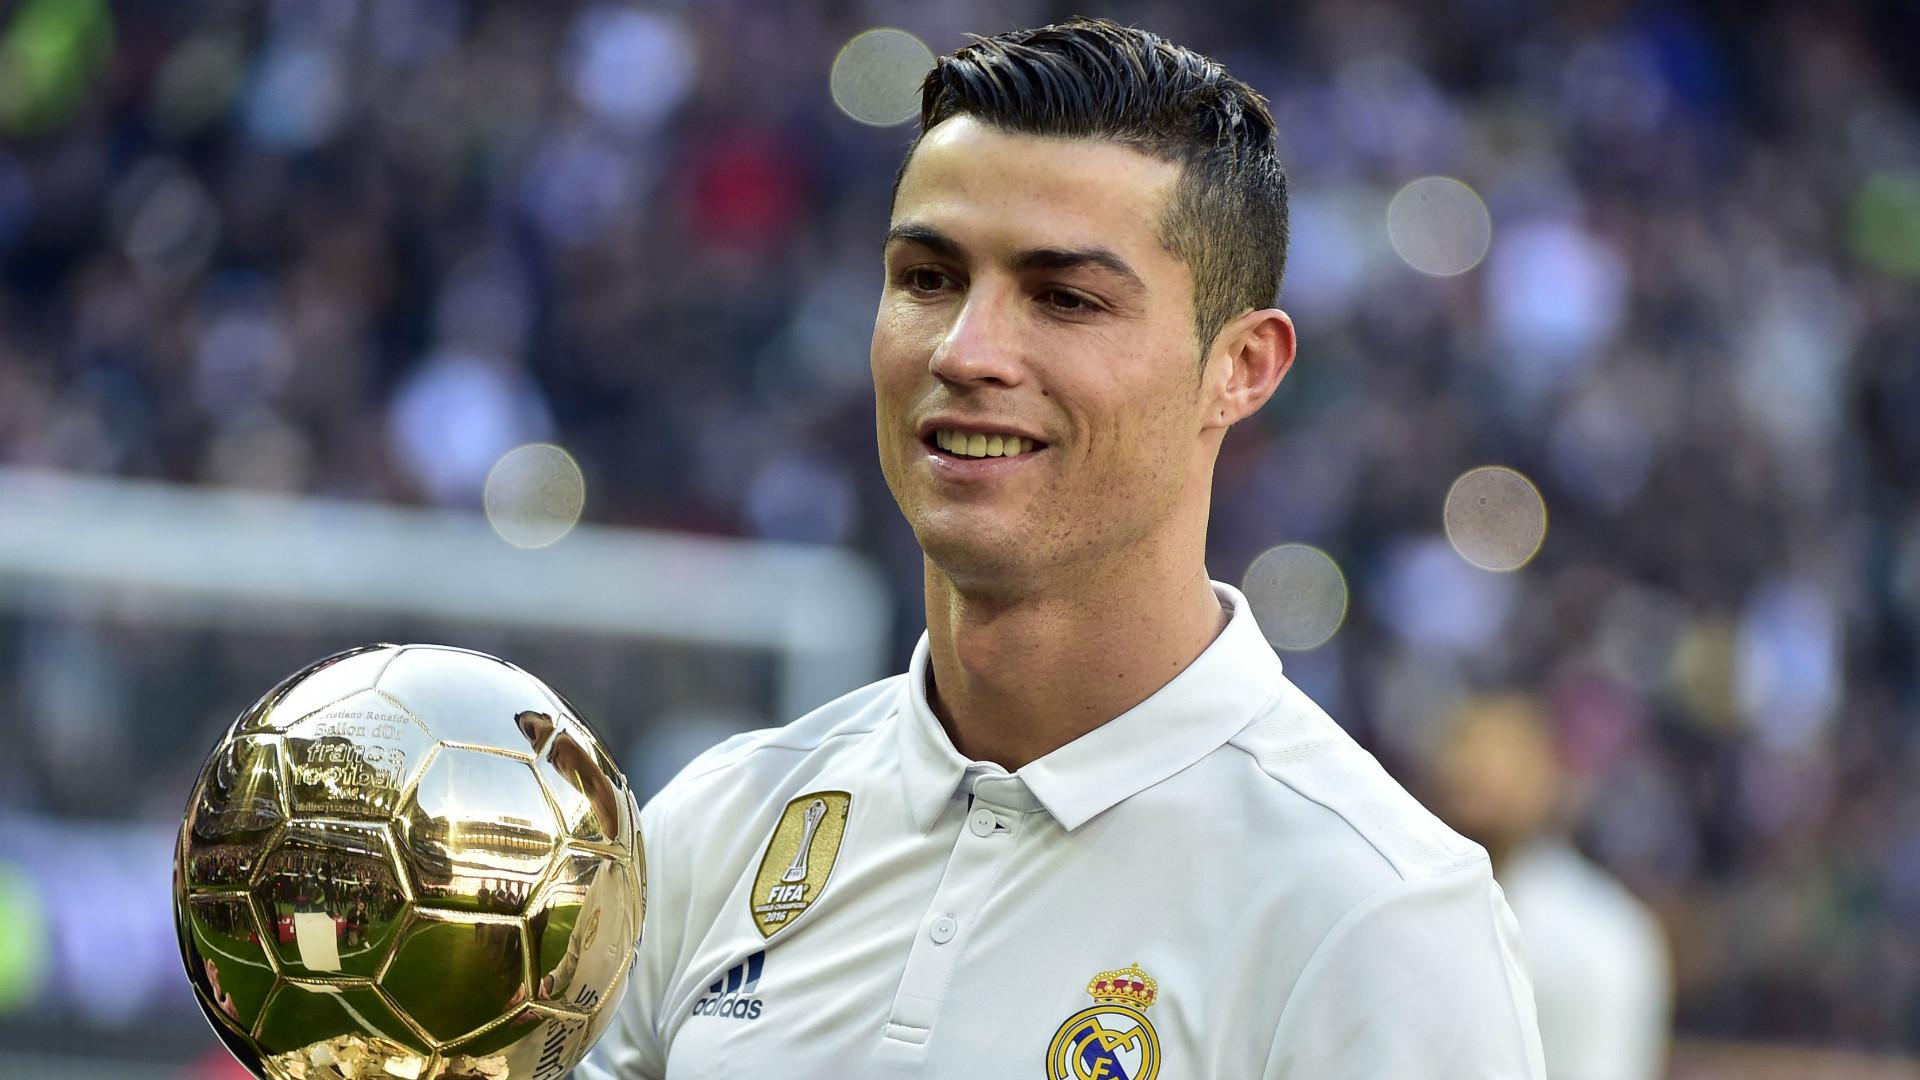 Cristiano Ronaldo haircuts The Real Madrid stars most memorable styles  Goalcom